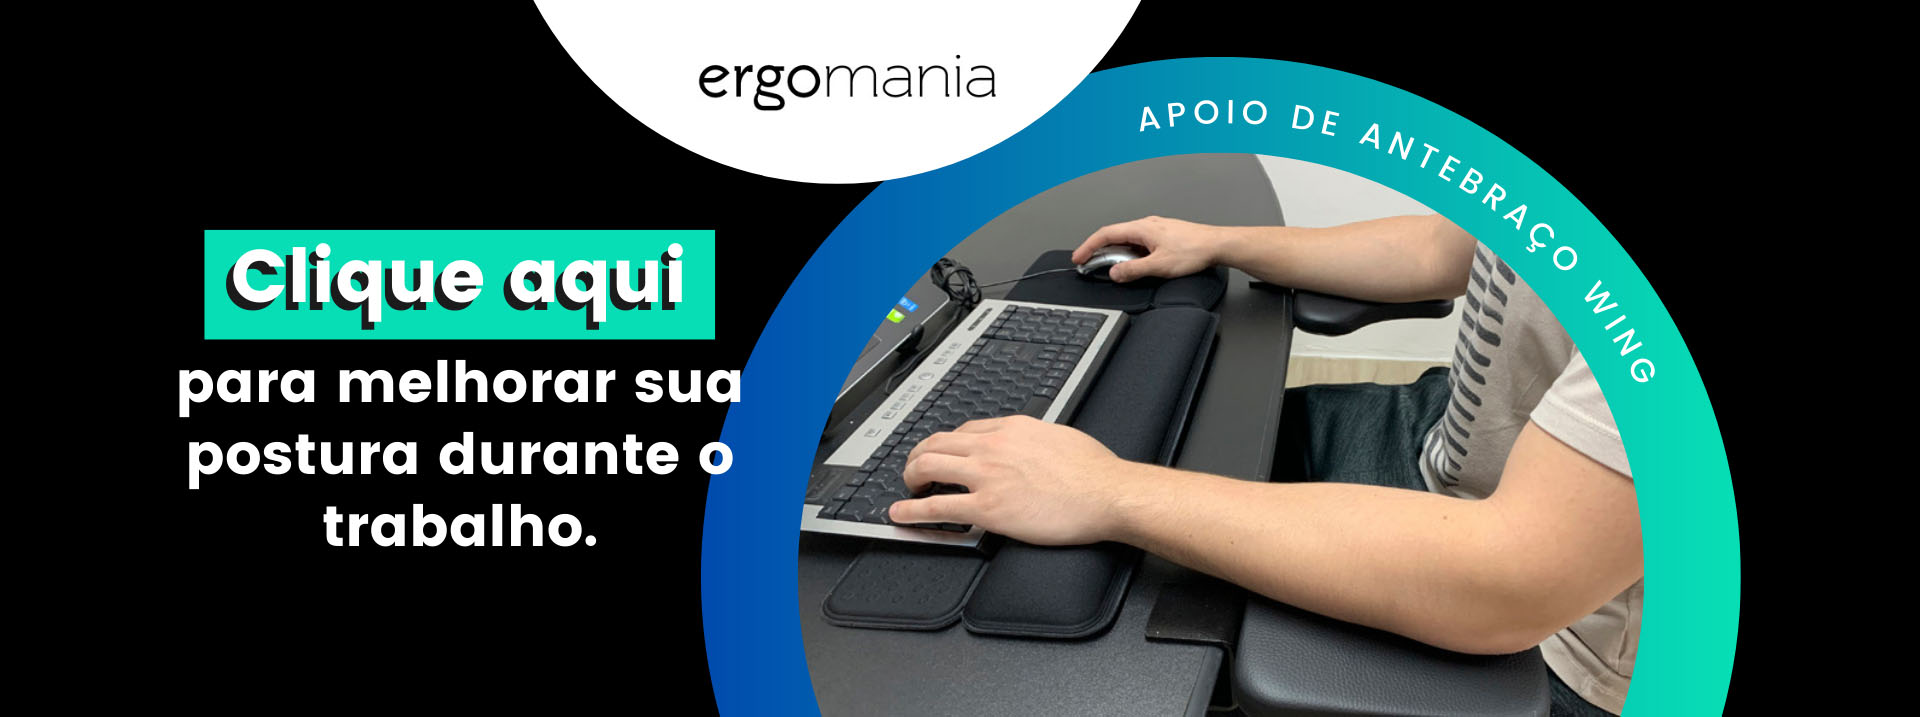 apoio-antebraco-ergonomico-wing-ergomania